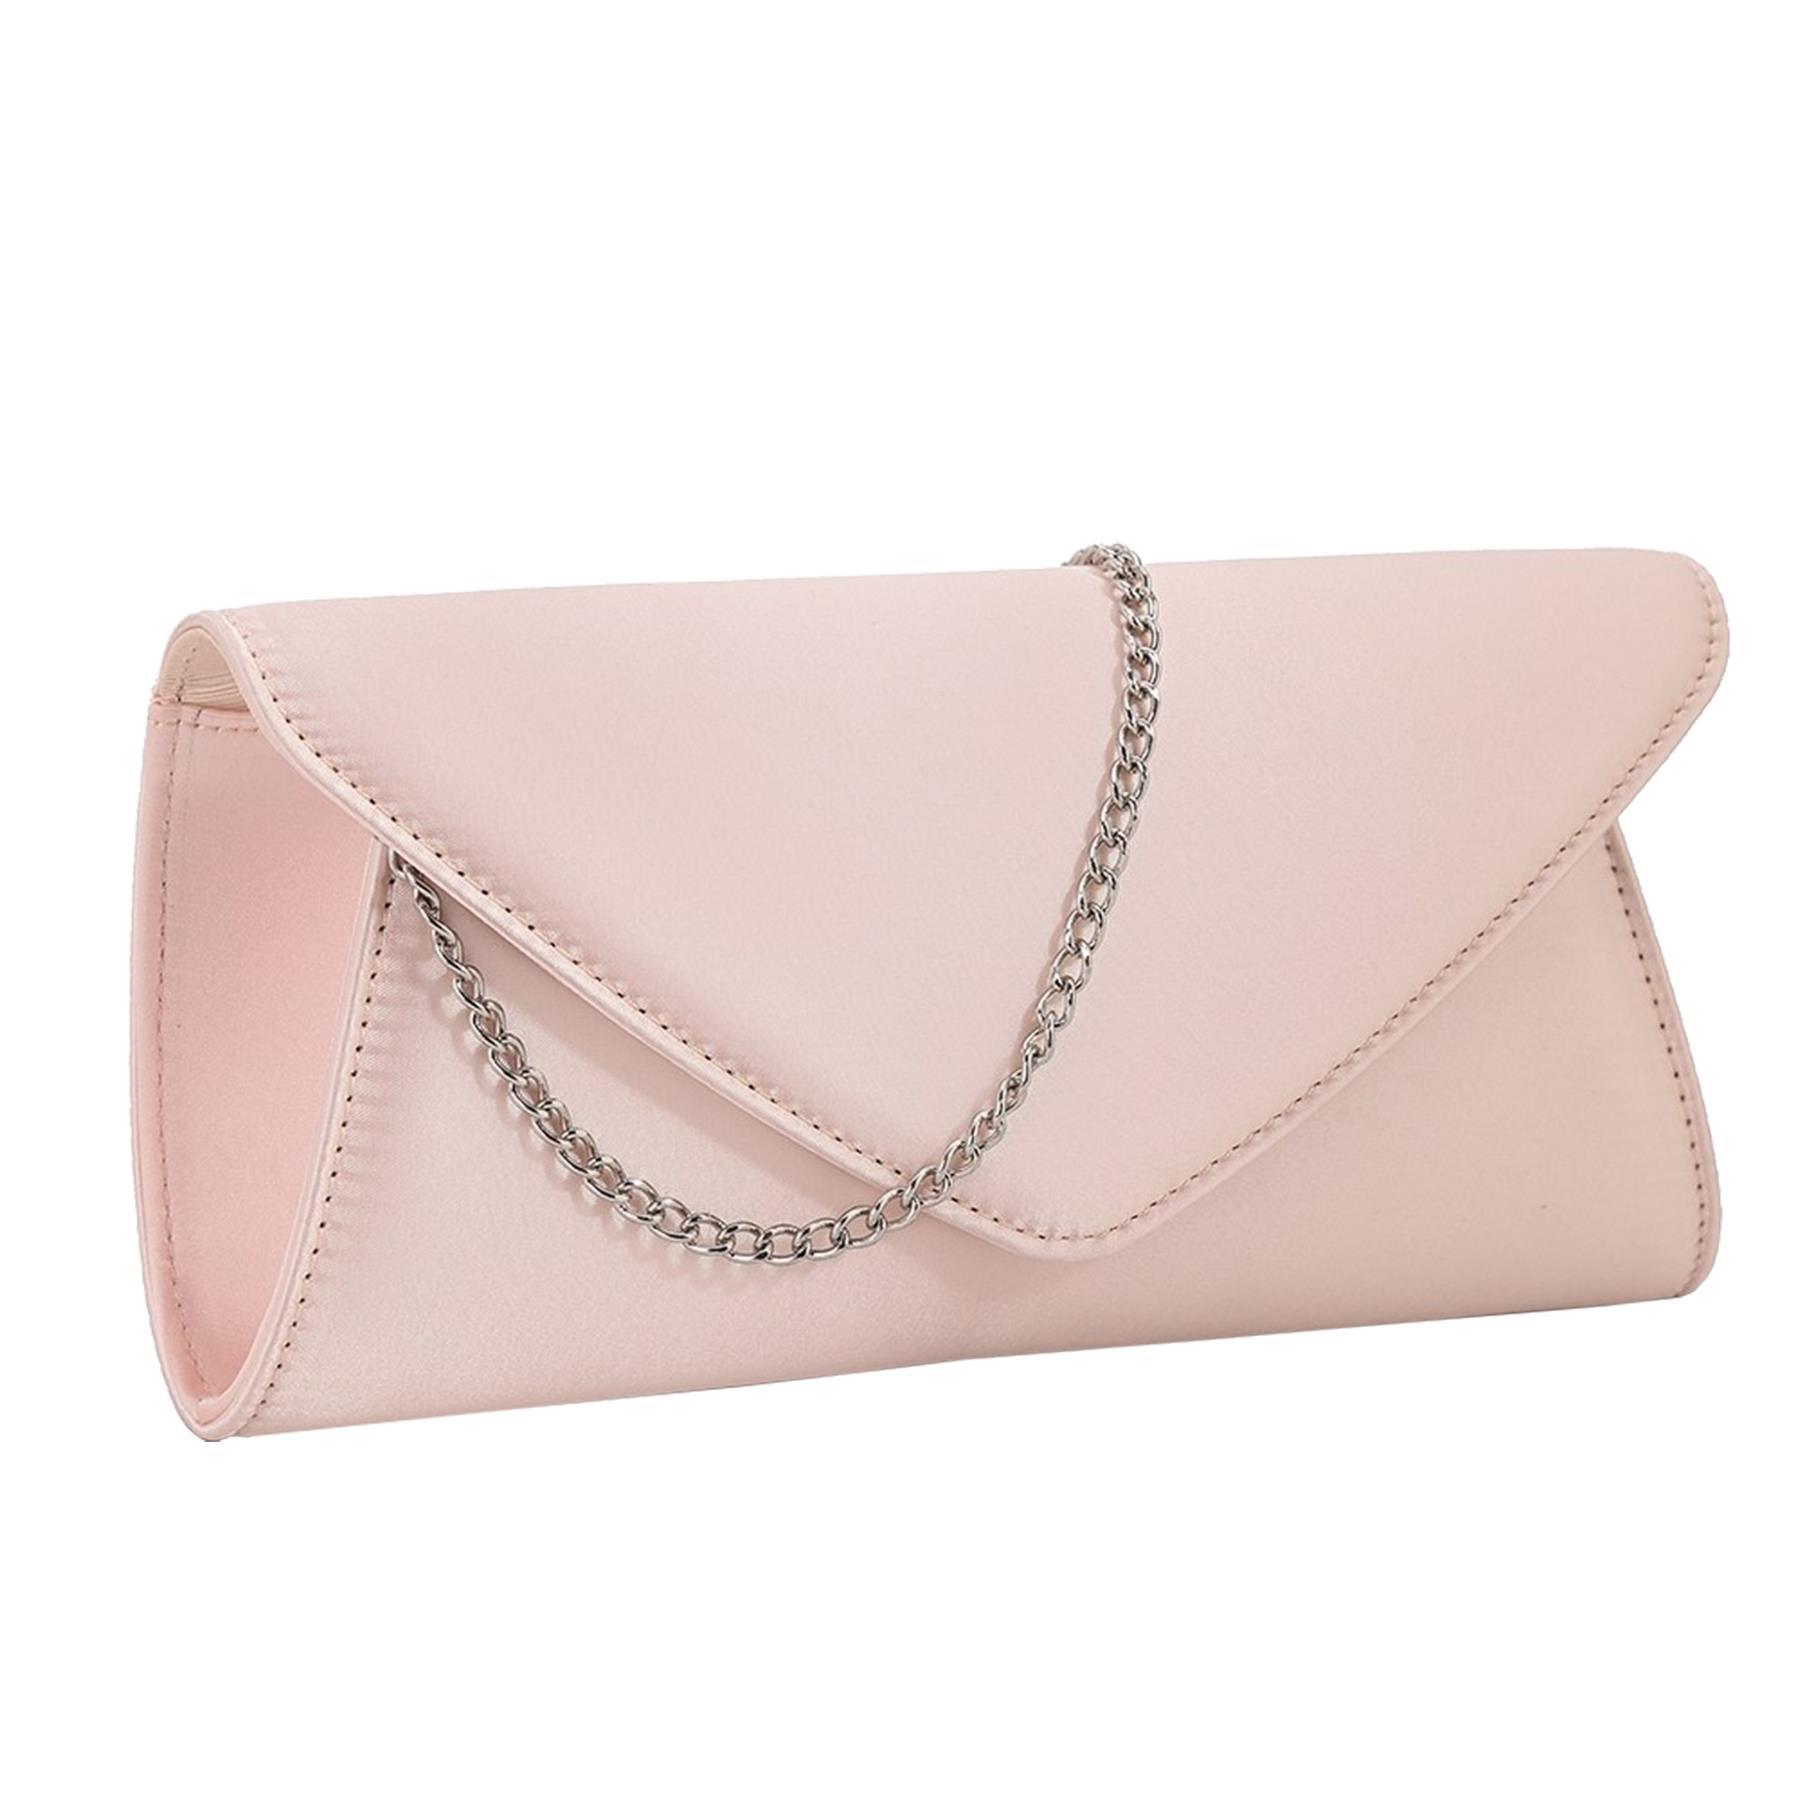 New-Ladies-Stylish-3D-Envelope-Satin-Prom-Party-Clutch-Bag-Purse thumbnail 9